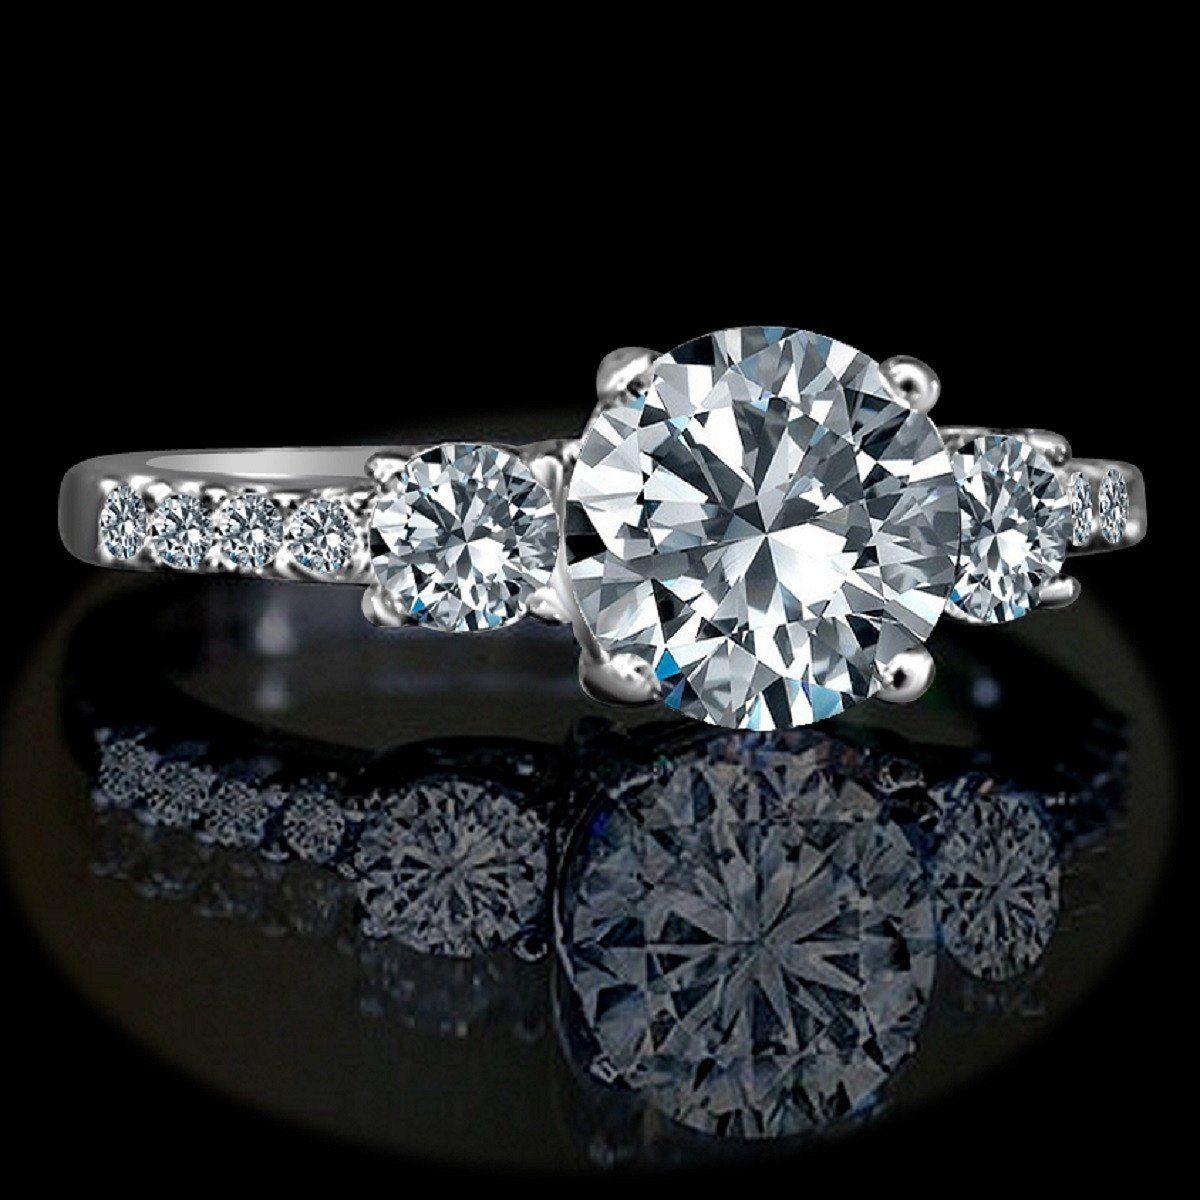 1.5 Ct Round Center (4mm Sides) Simulated Diamonddiamond